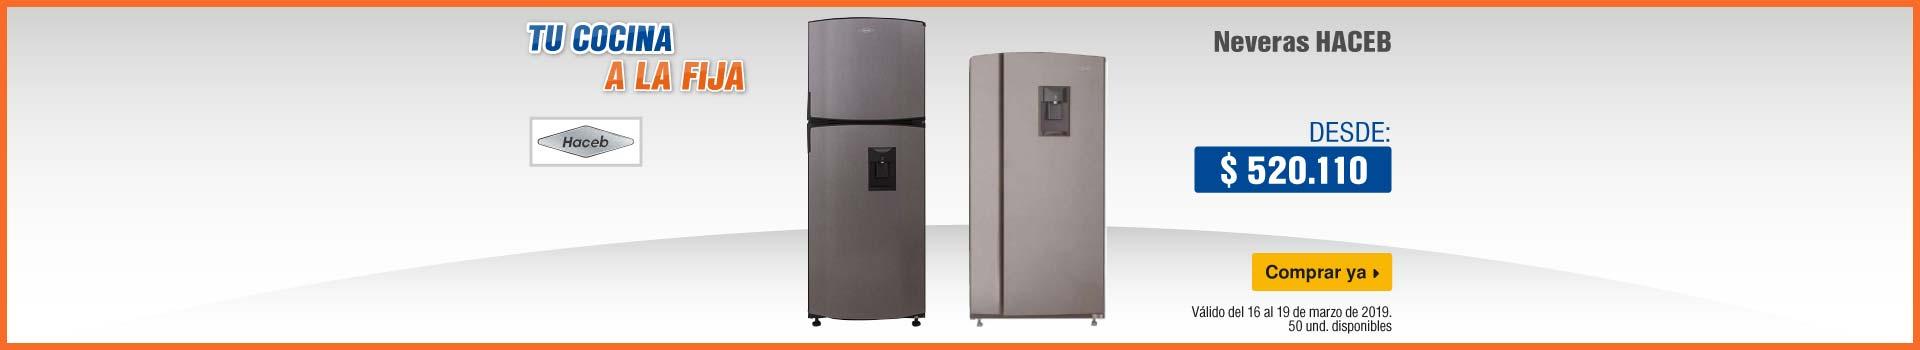 AK-KT-mayores-1-ELECT-BCAT-refrigeracion-haceb-160319-2